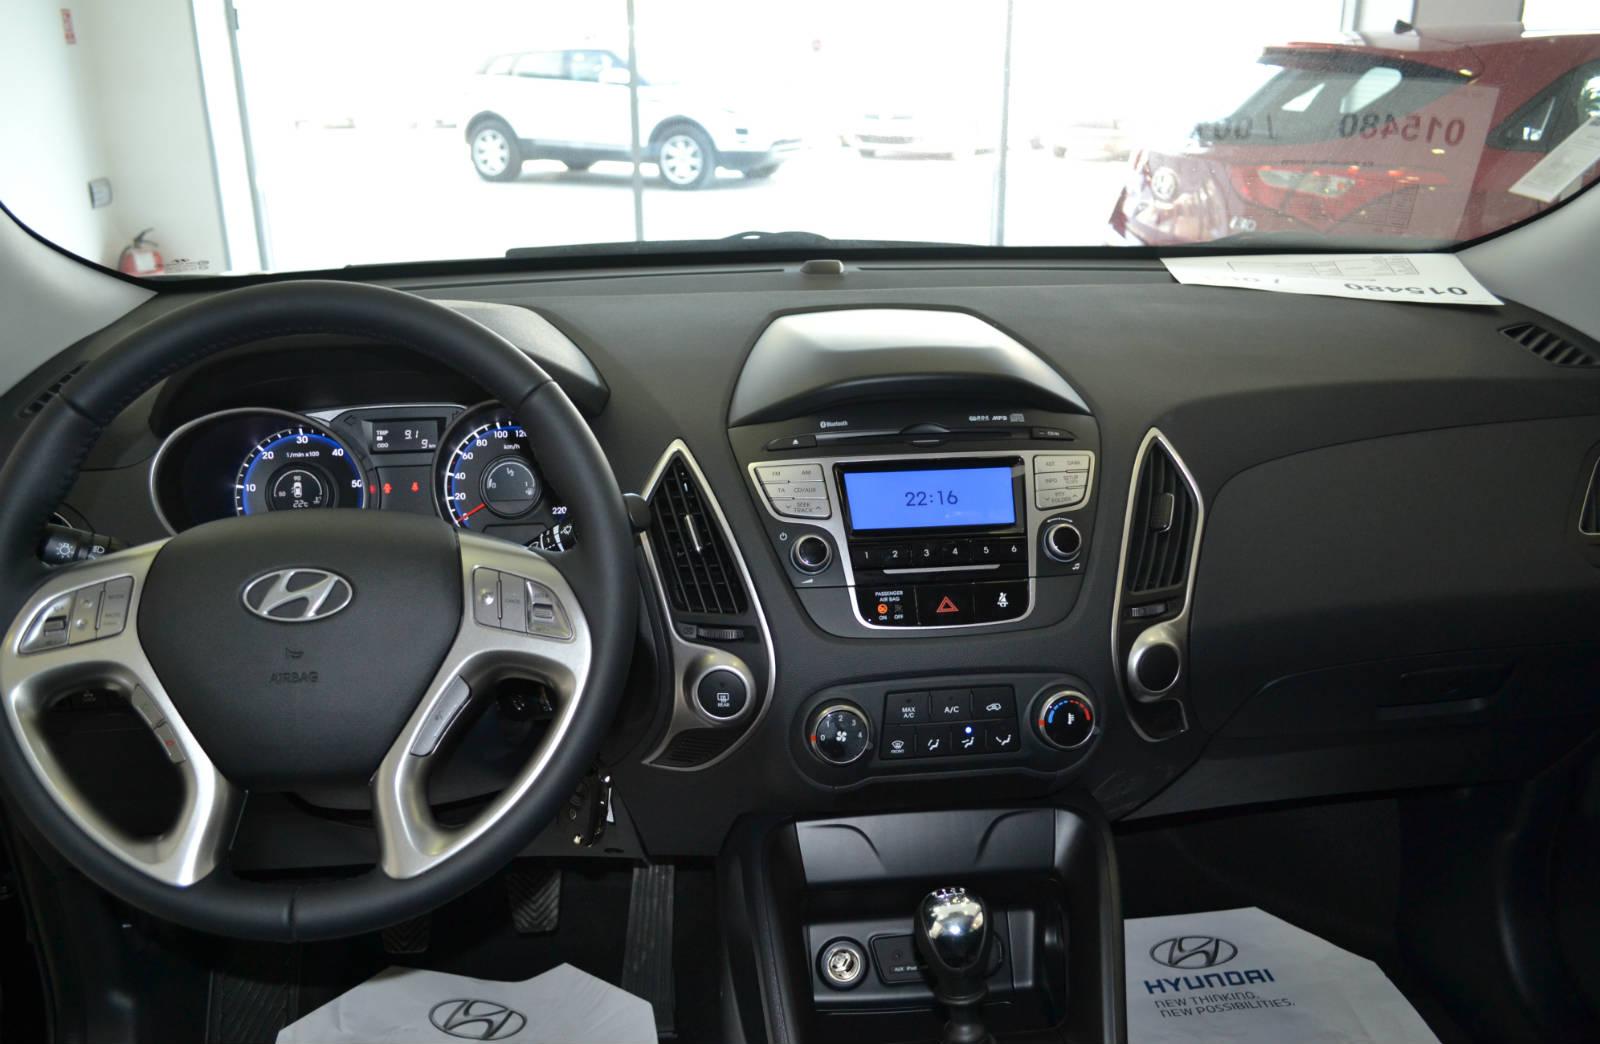 100 Hyundai Tucson 2016 Interior 2017 Hyundai Azera Interior Hd Wallpaper 36362